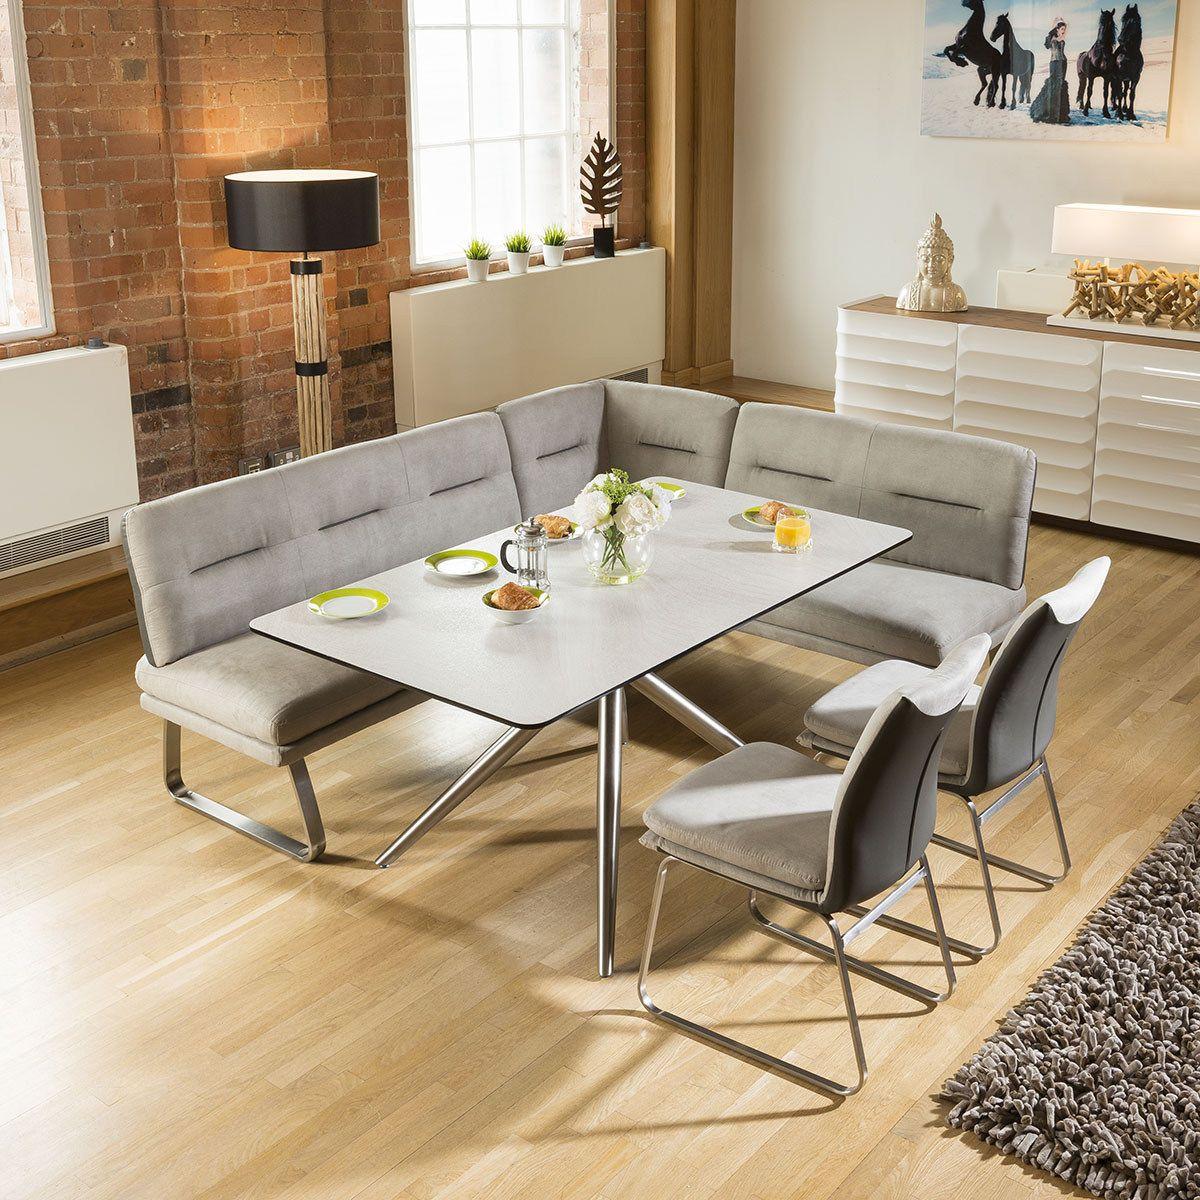 Inspiralo Etkezok Dining Nook Dining Room Design Interior